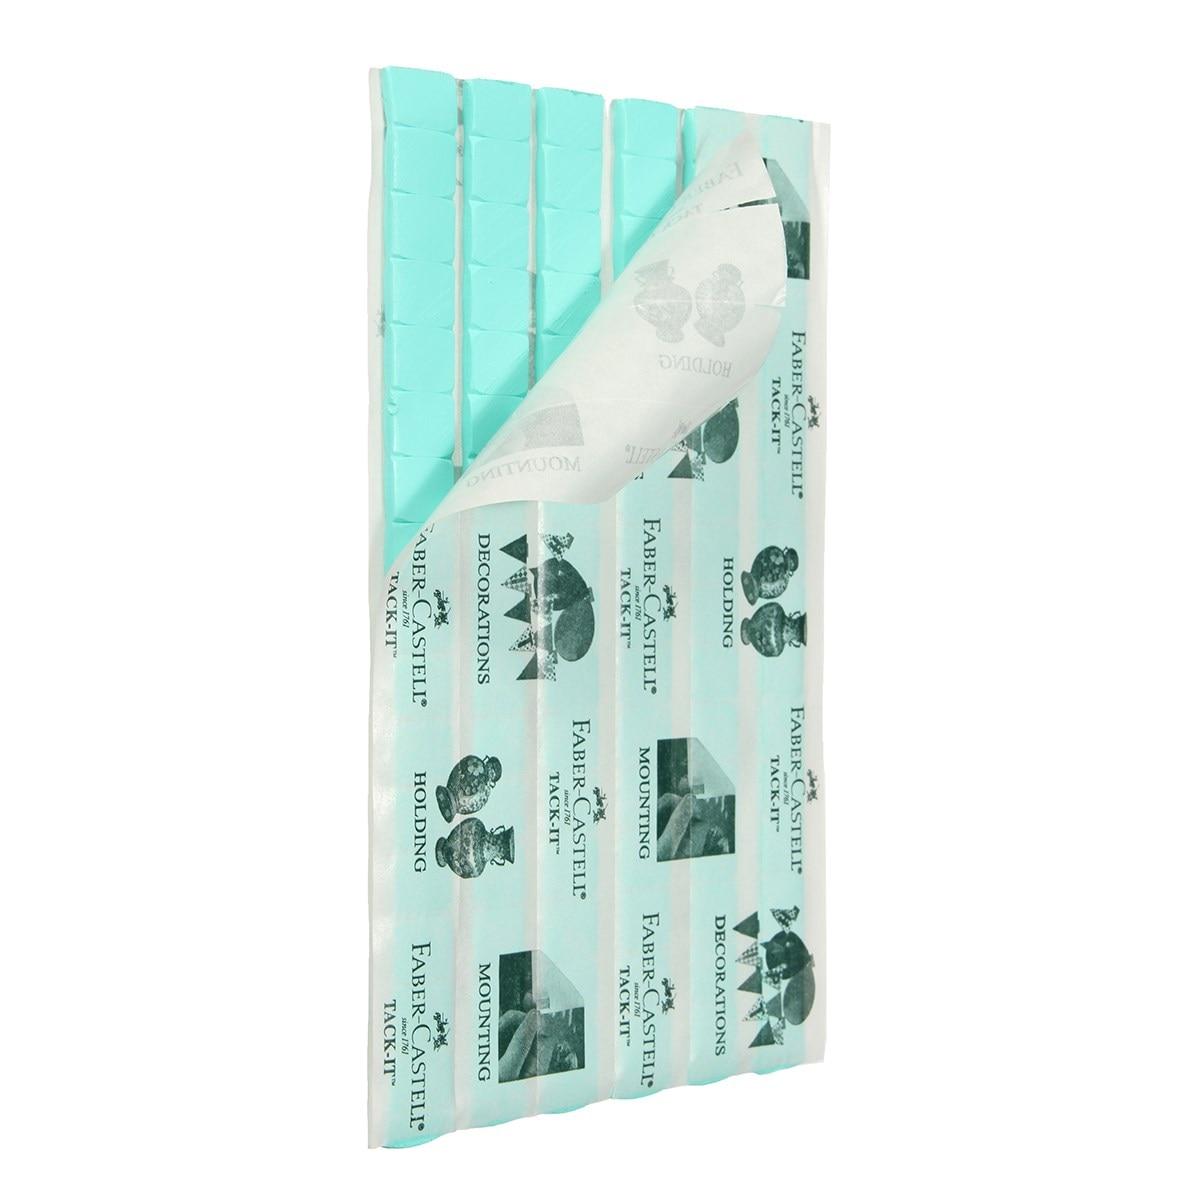 Nail Art Clay Removable Adhesive Glue Tape Non-trace Reuse For Nail Art DIY Decoration Nail False Mancine Tools